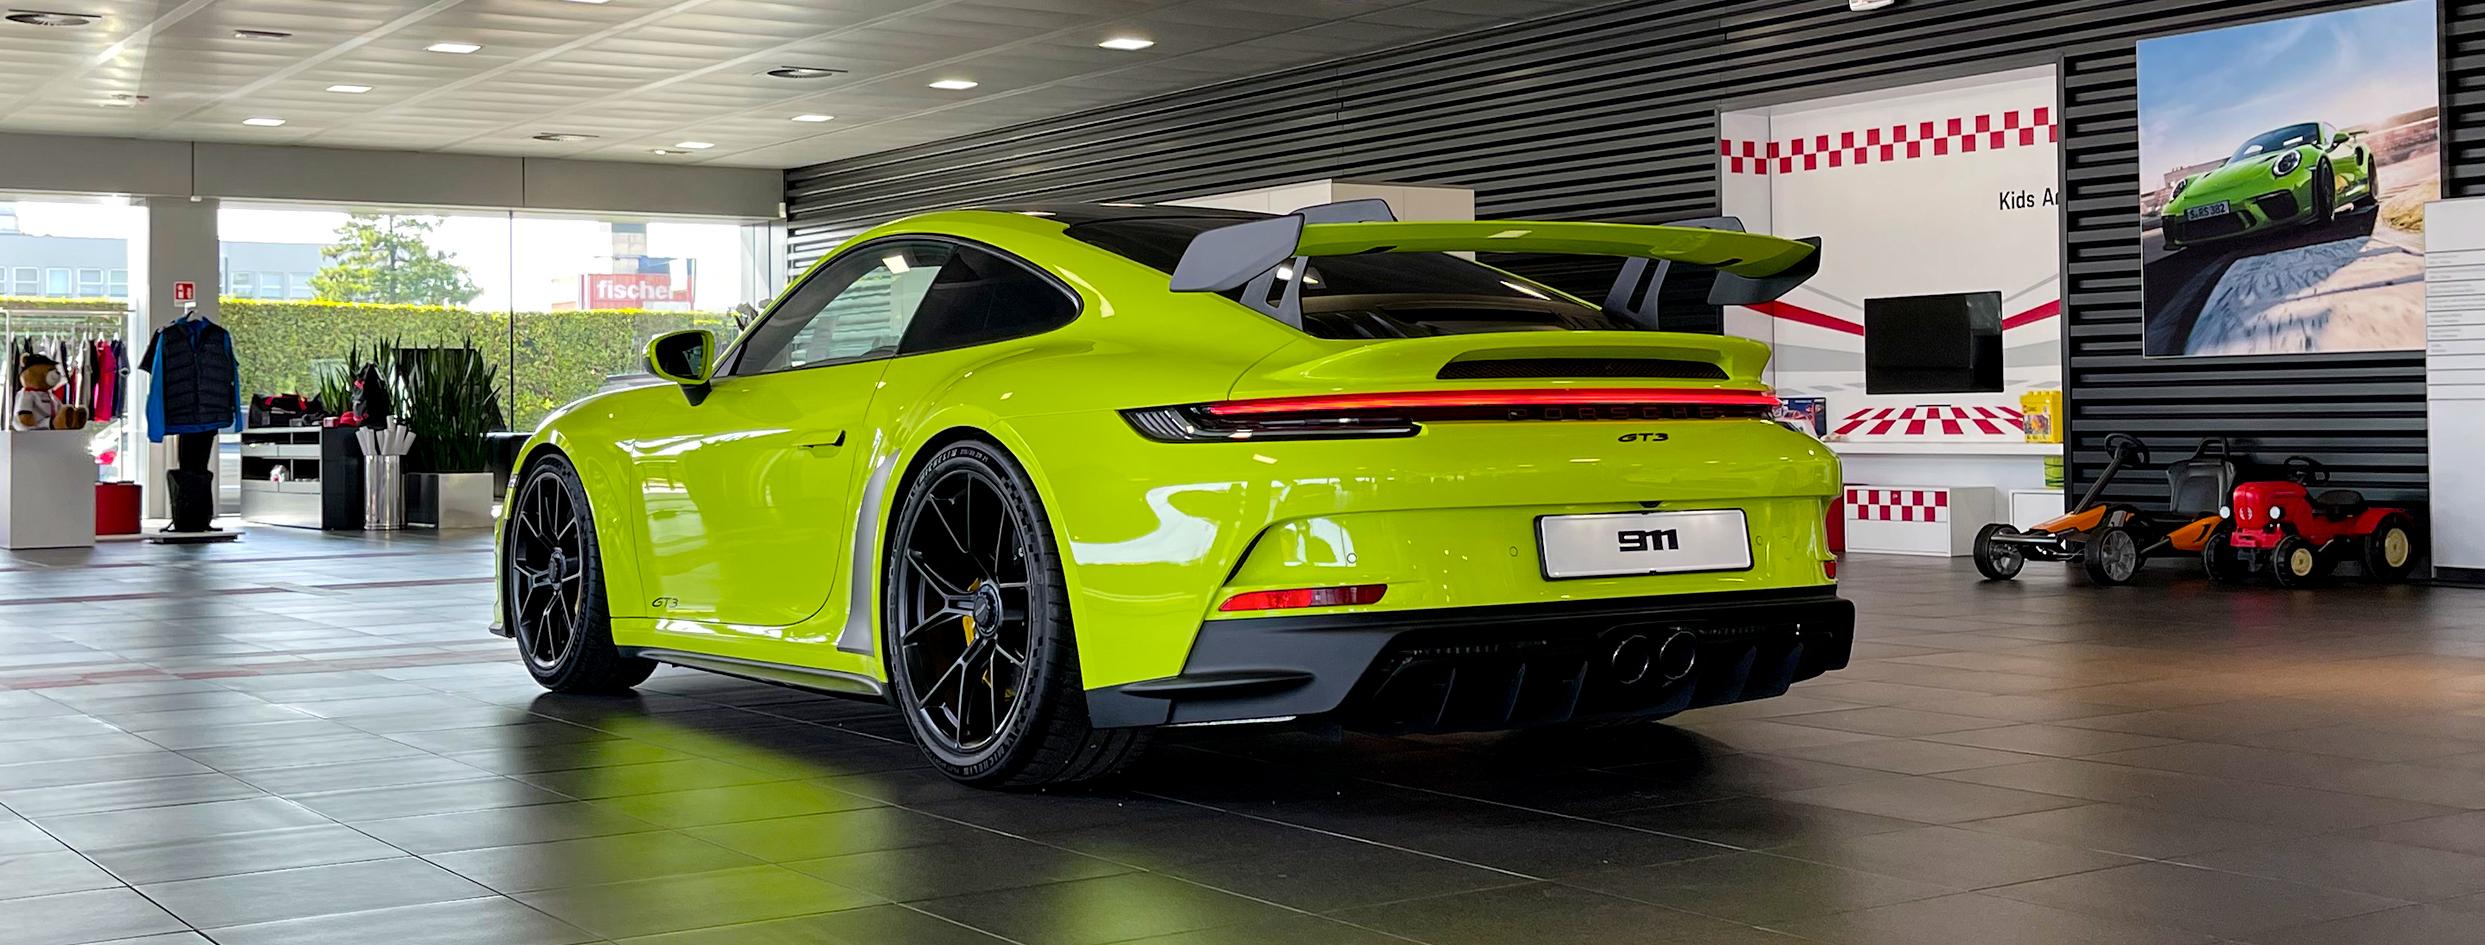 La nuova Porsche 911 GT3.